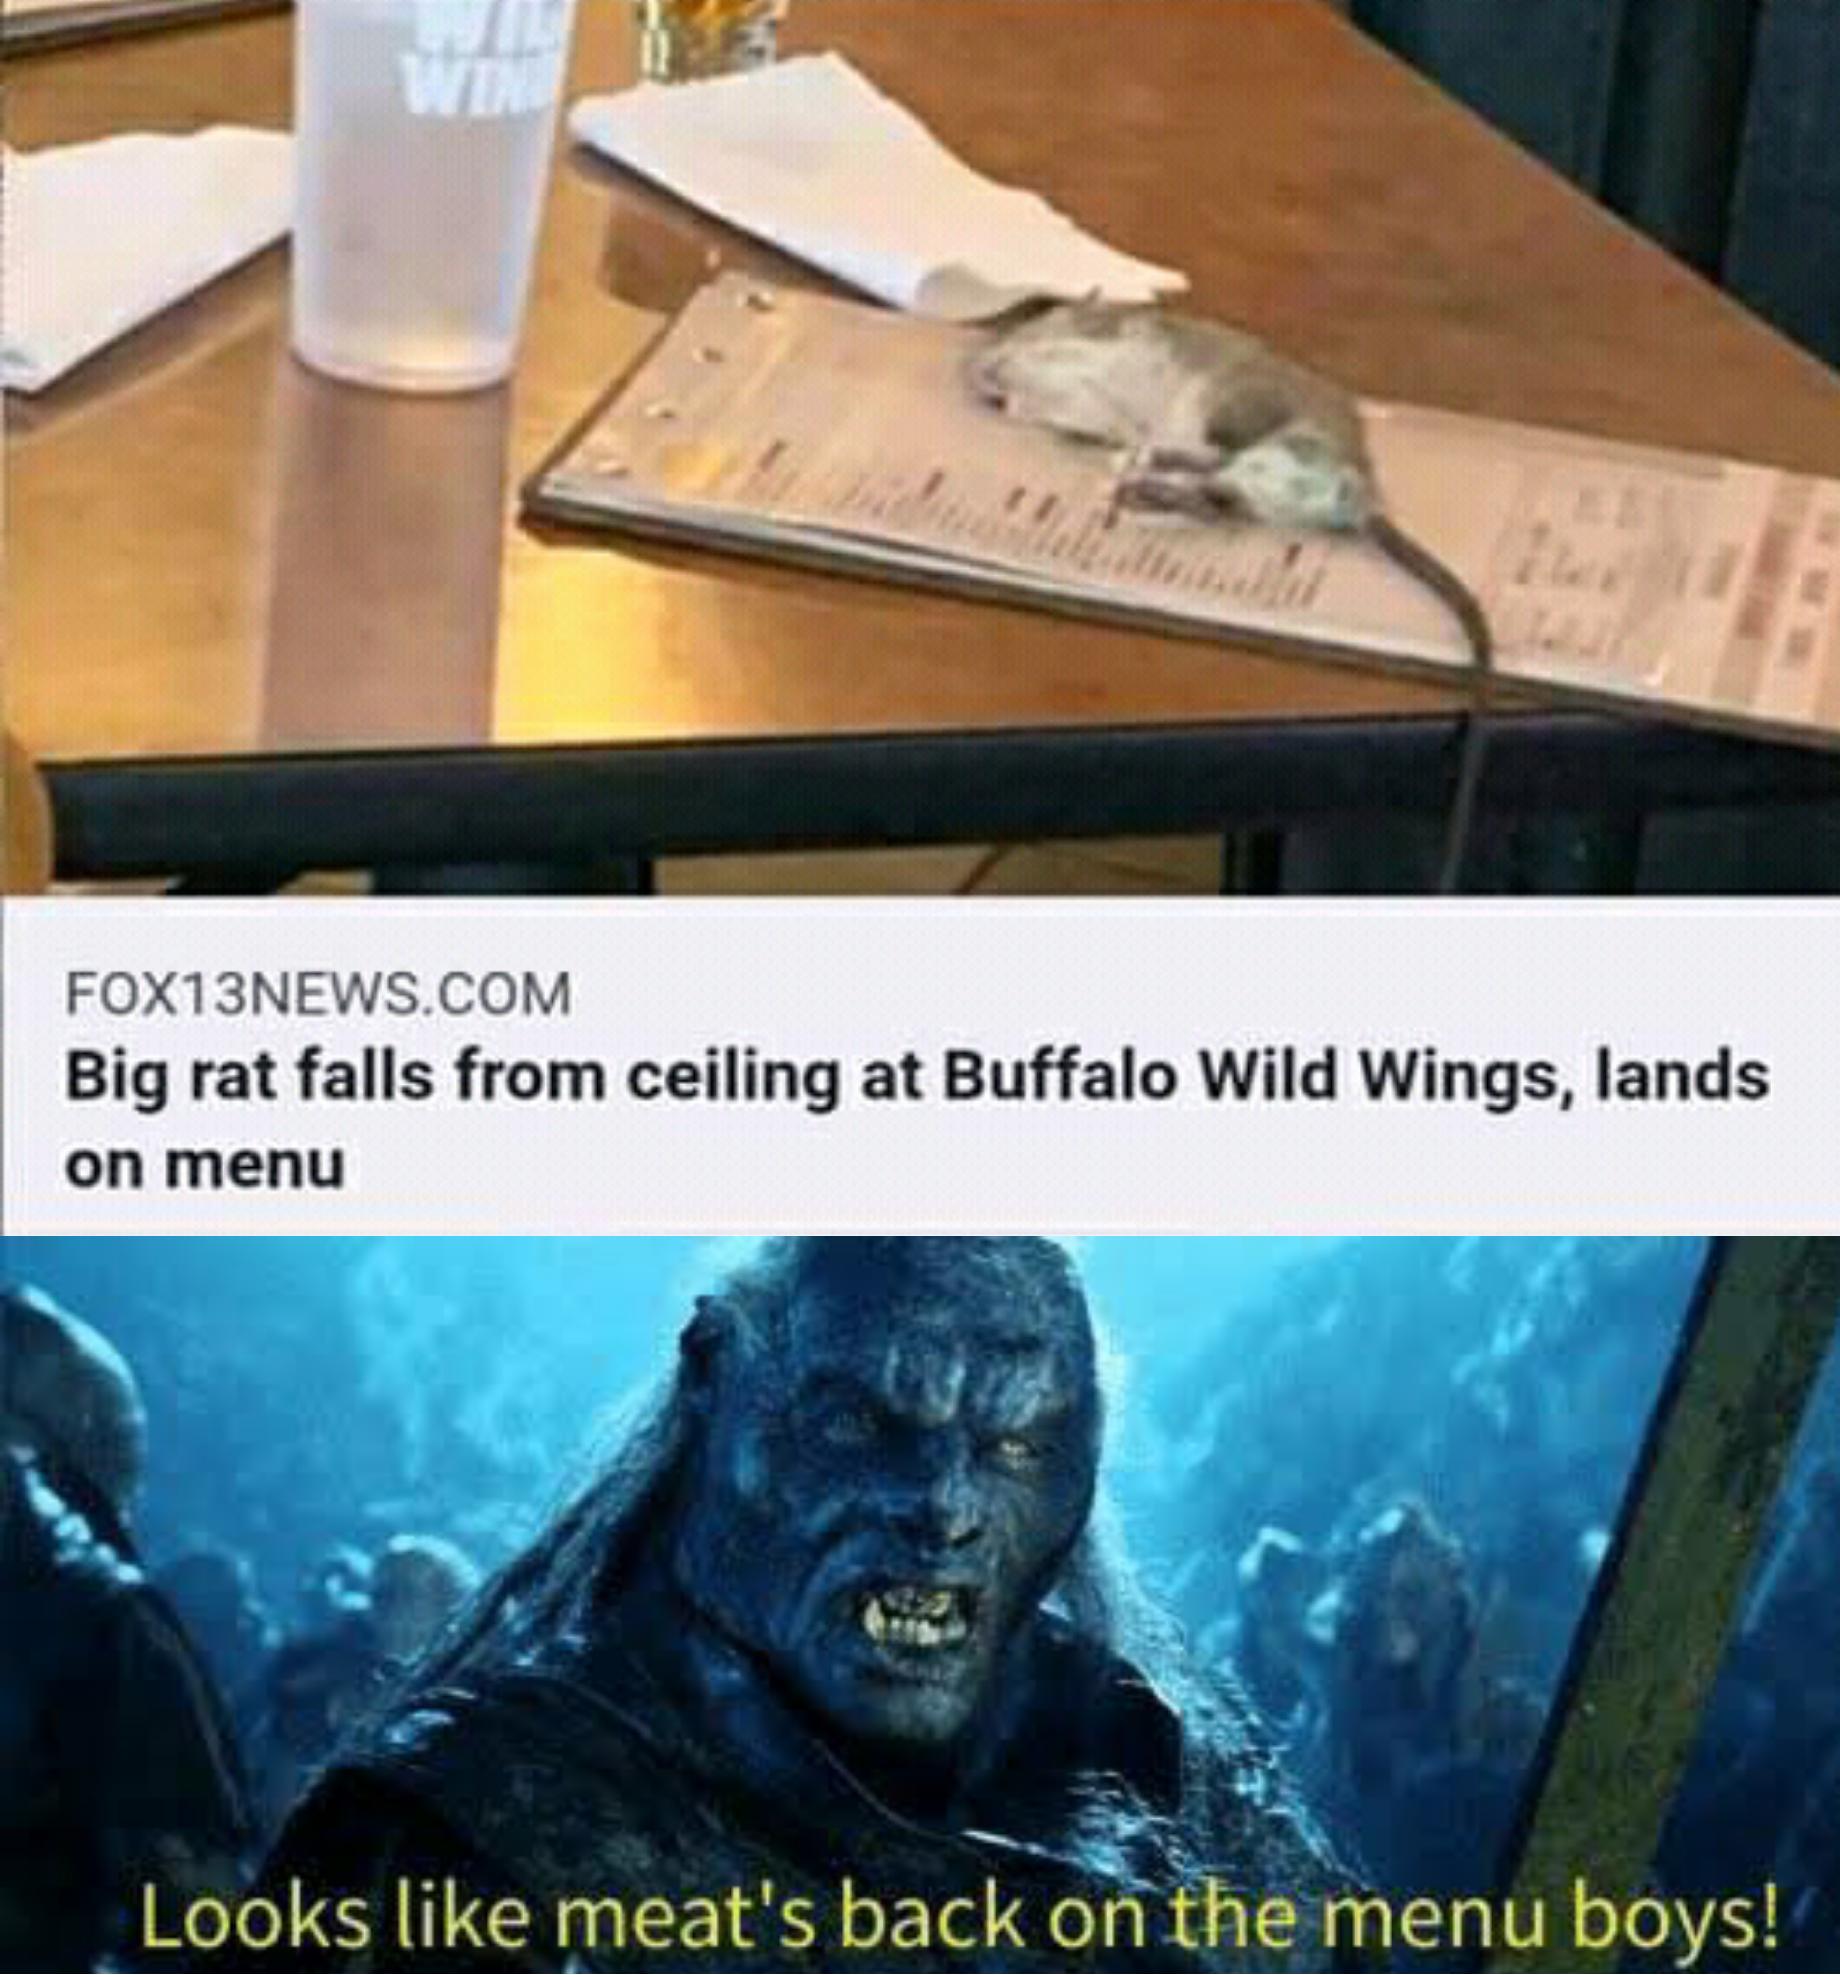 Finally some good ***ing food